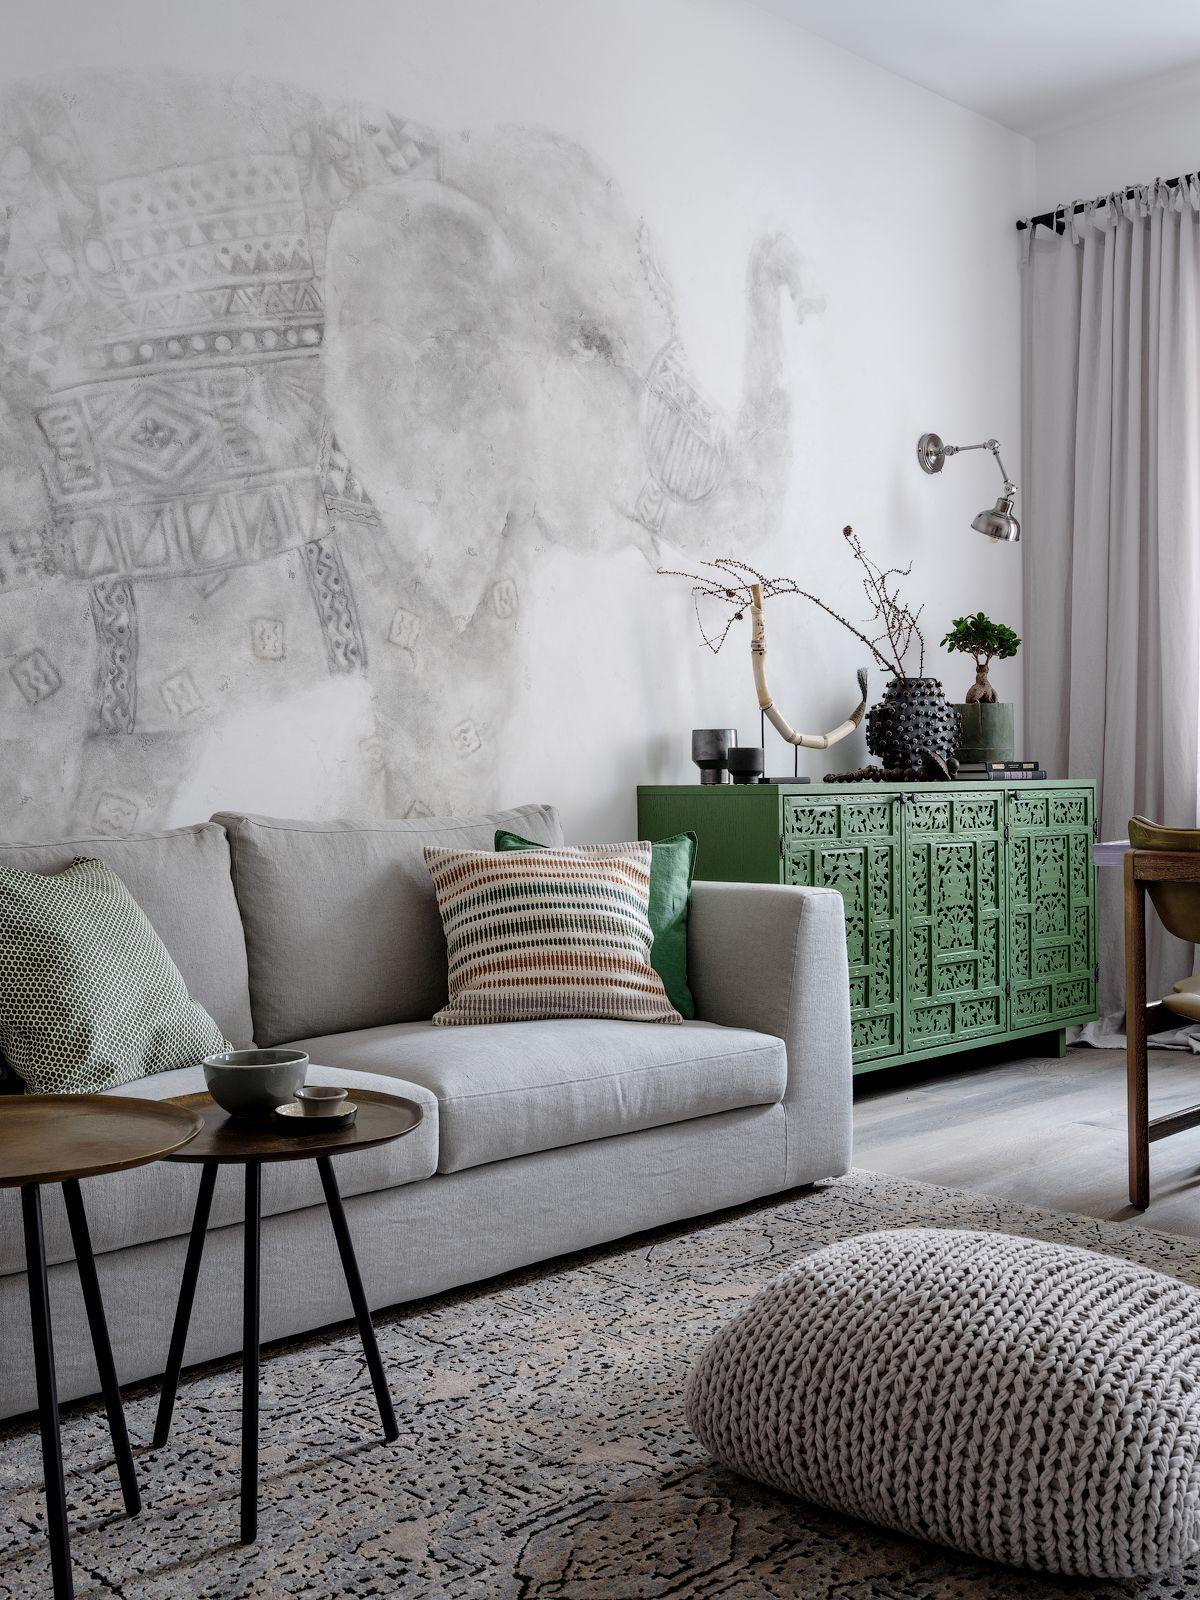 adelaparvu.com despre apartament 90 mp, design Minina Design, Foto Mikhail Loskutov (11)